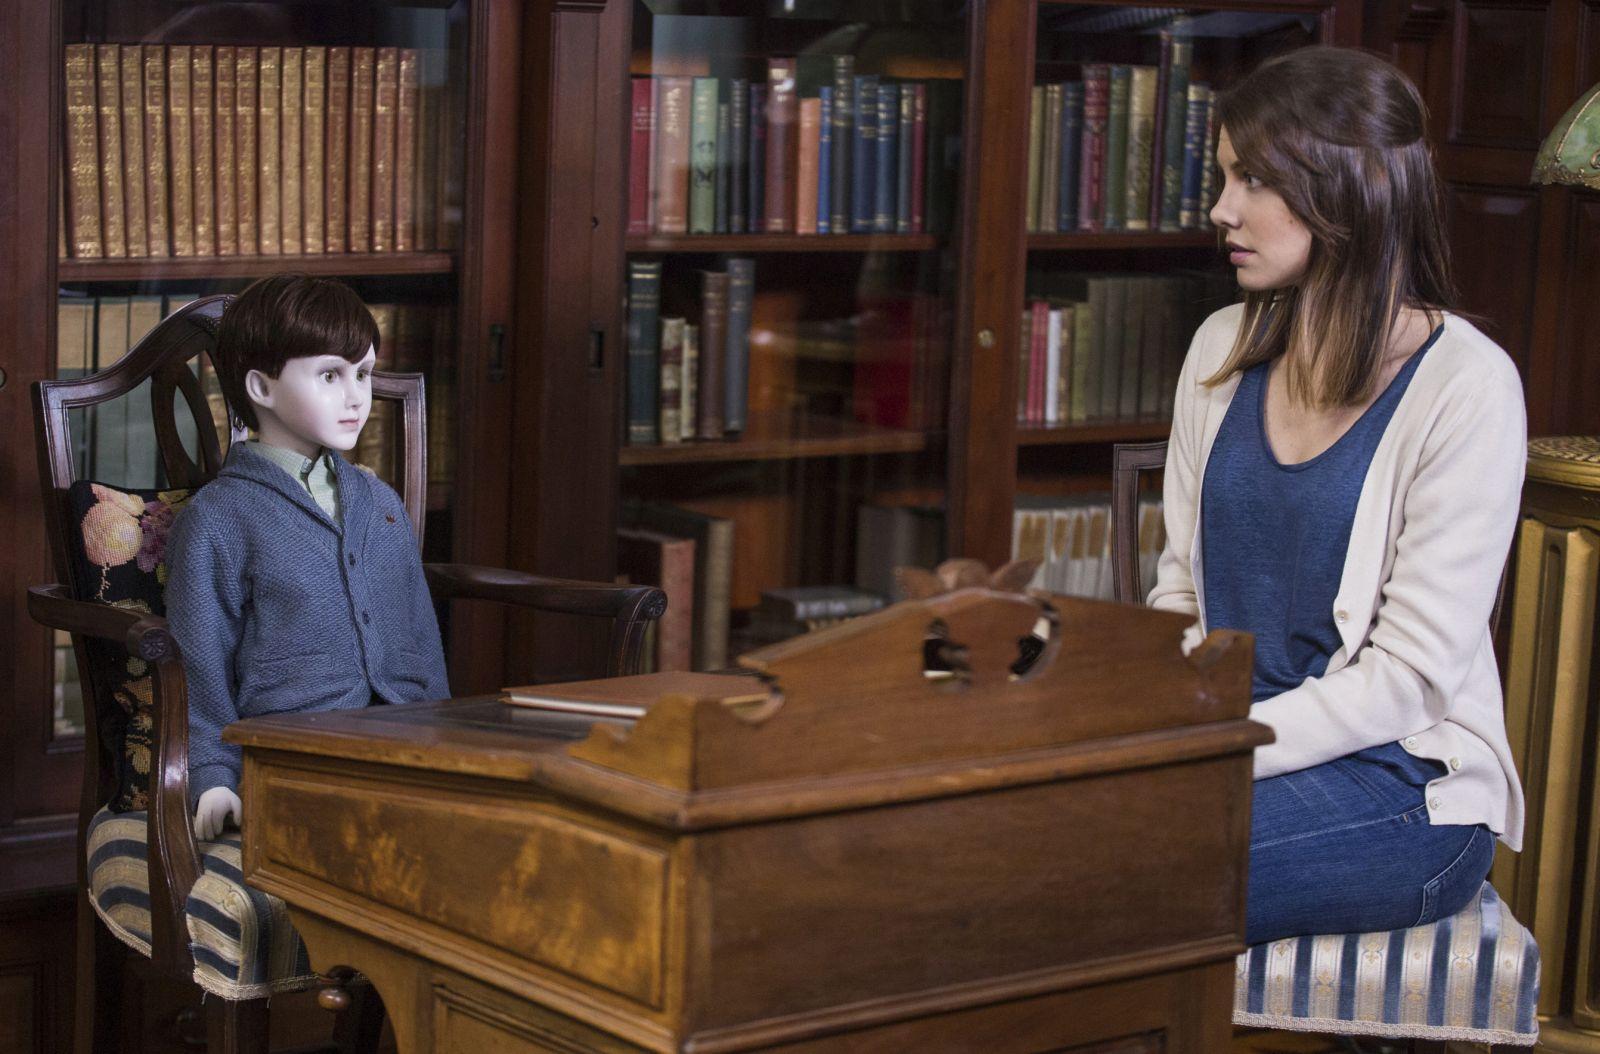 The Boy: Lauren Cohan con la bambola che deve accudire